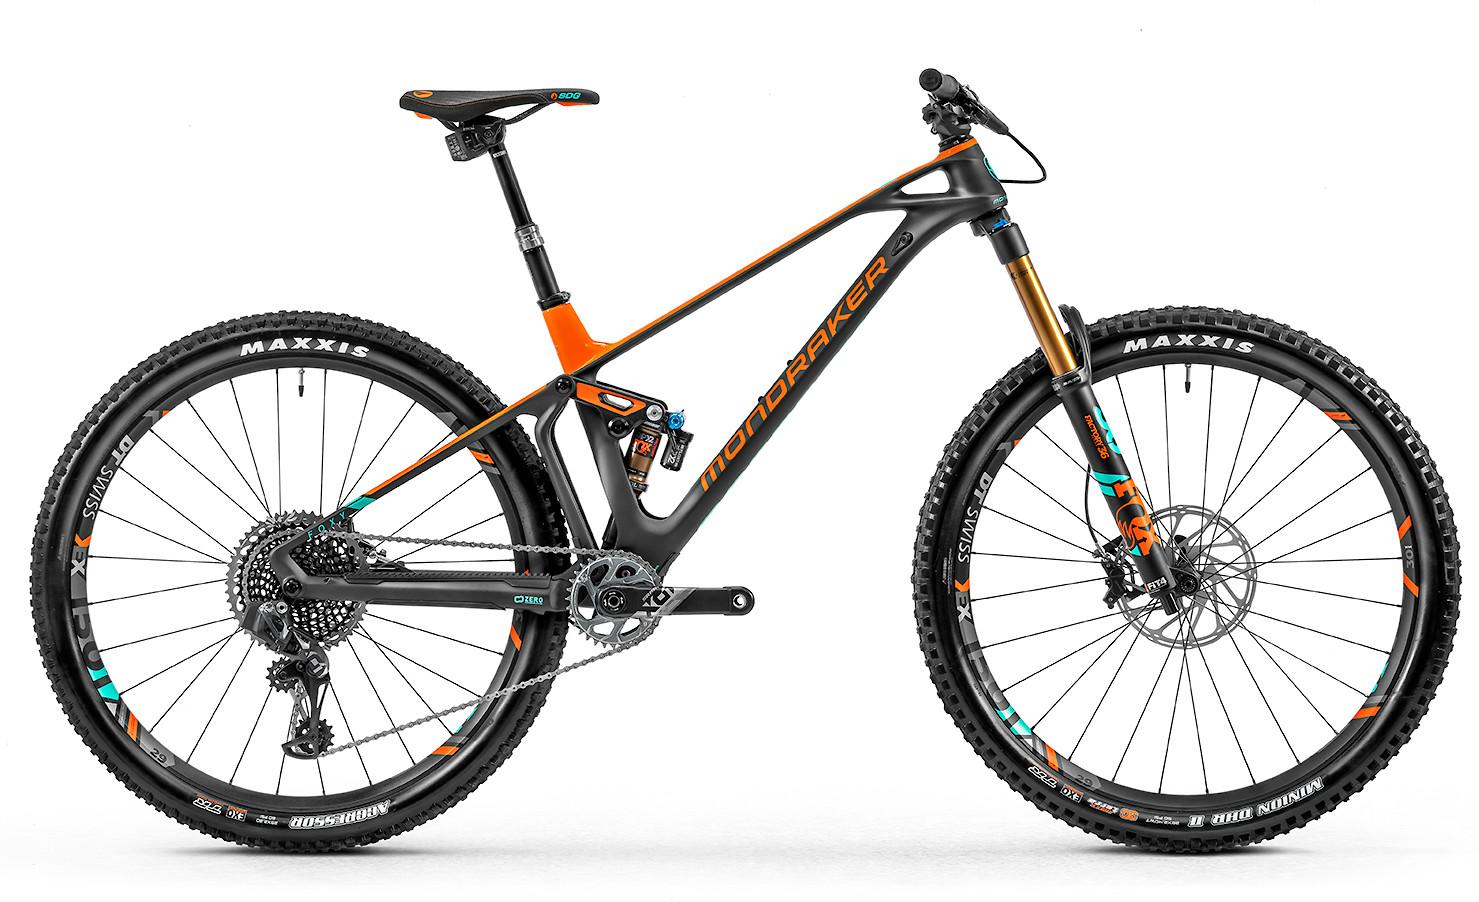 2020 Mondraker Foxy Carbon RR SL